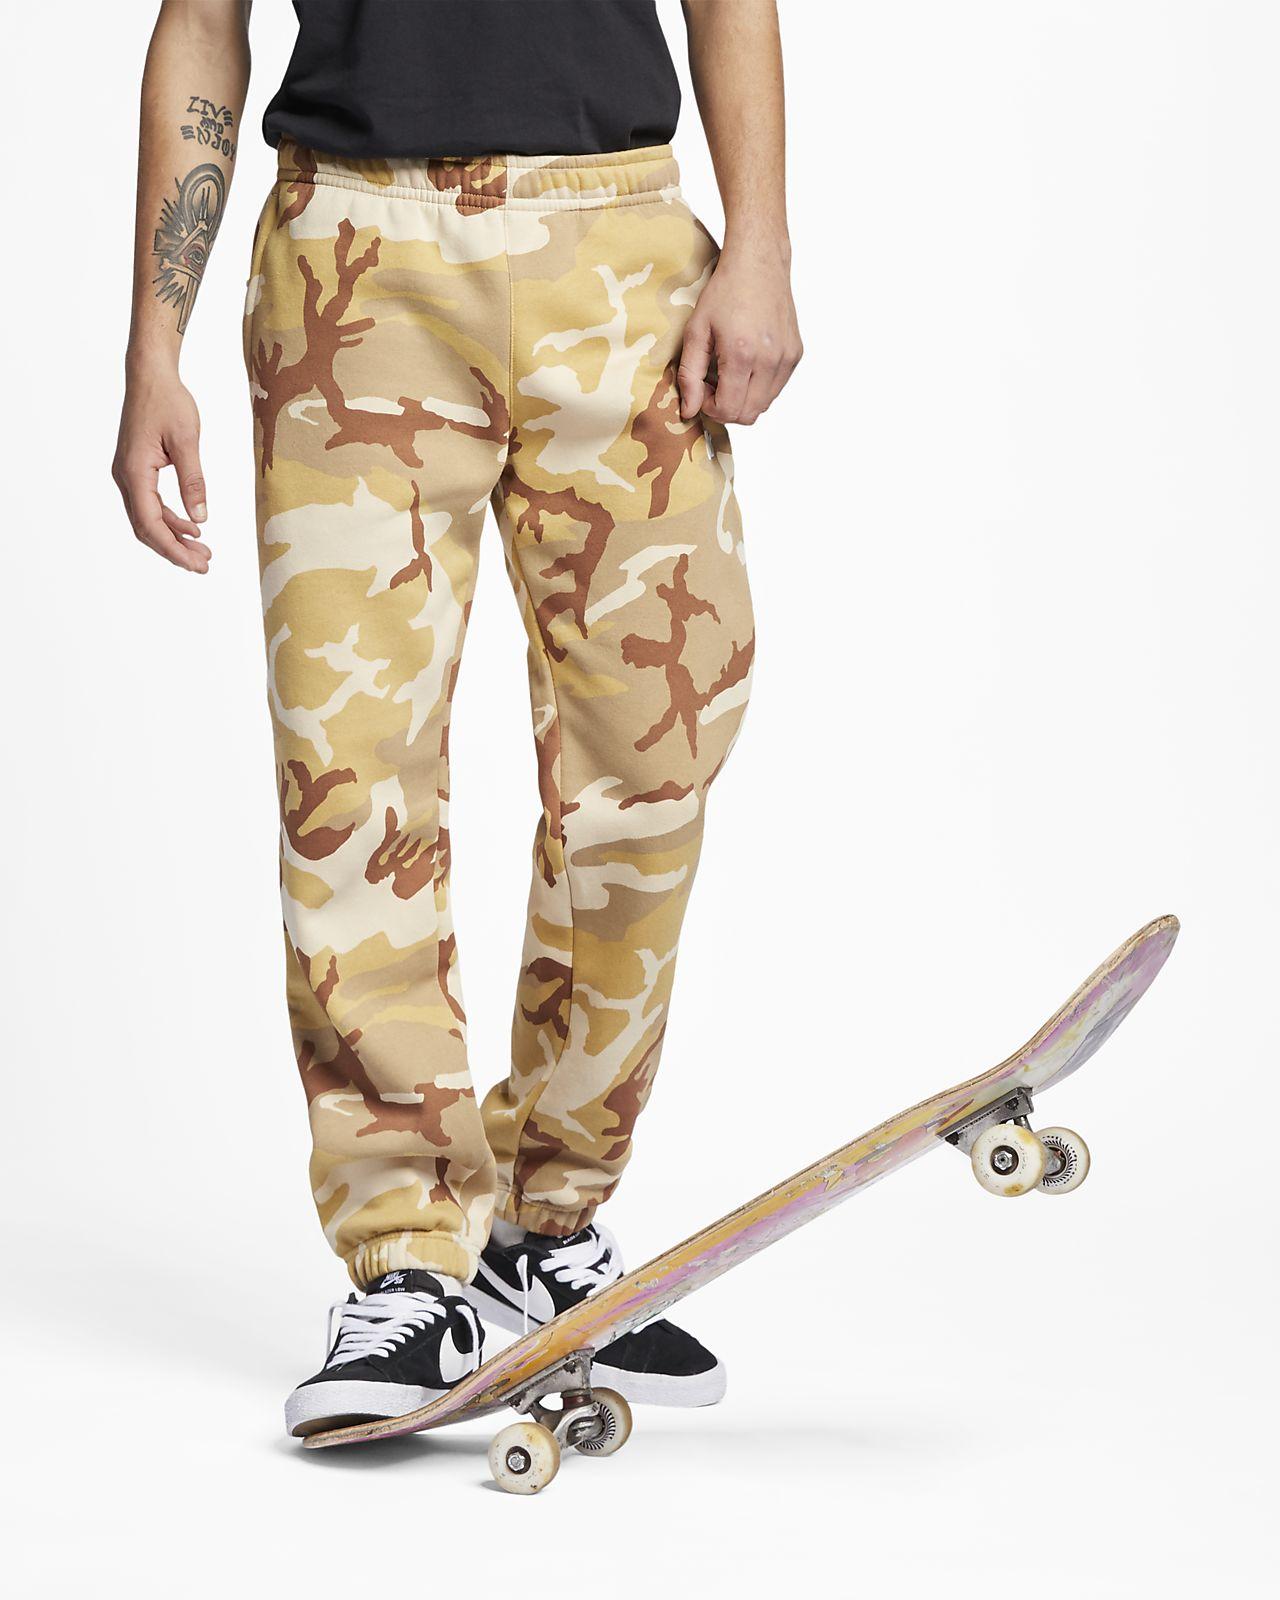 b0346f1784 Camouflage Pour Skateboard Homme Be De Nike Sb Pantalon Icon 7zxOE